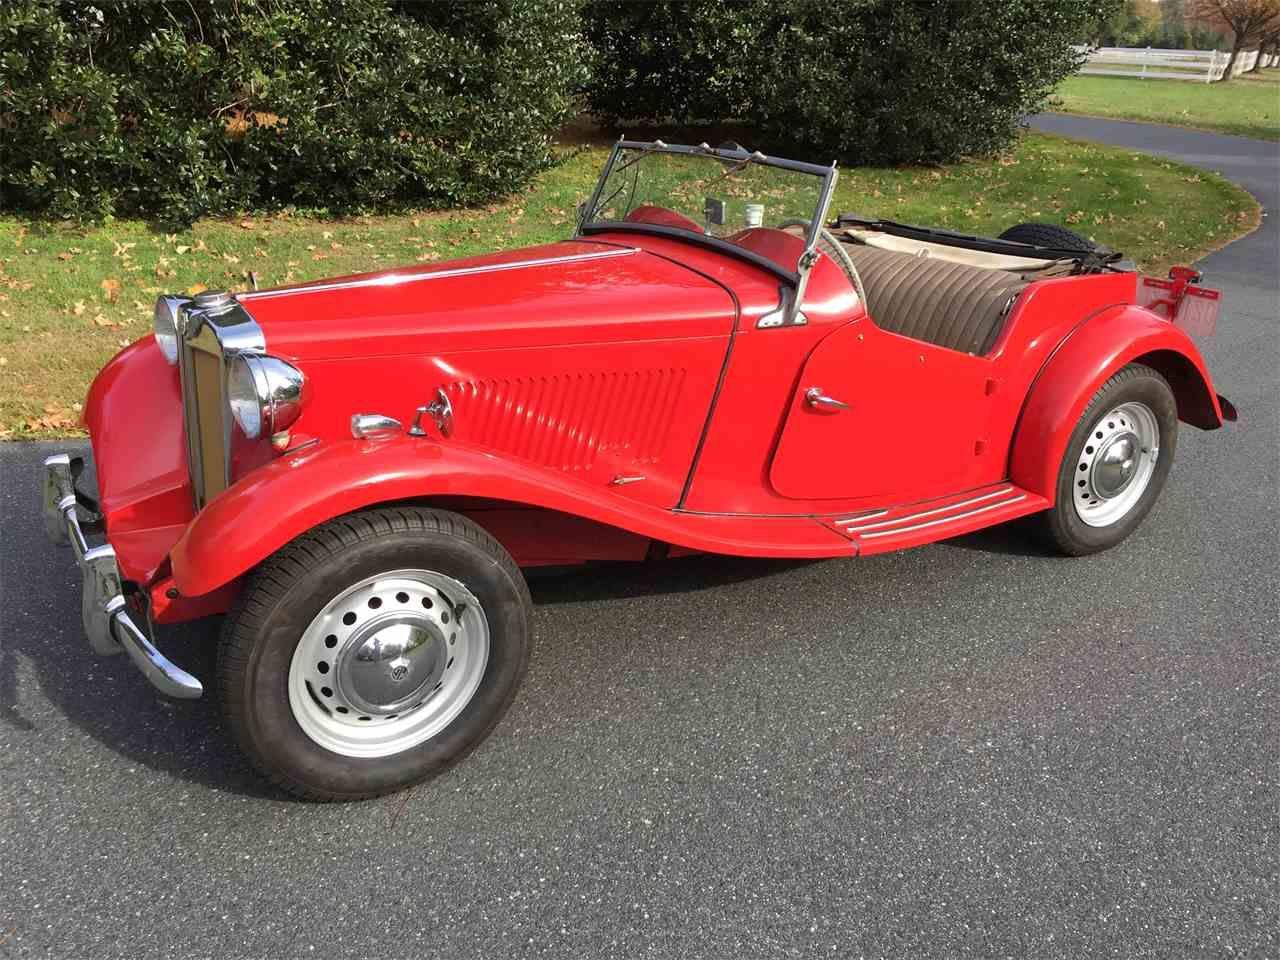 New Car. Old Car: 1953 MG TD   https://newcaroldcar.blogspot.com.eg ...